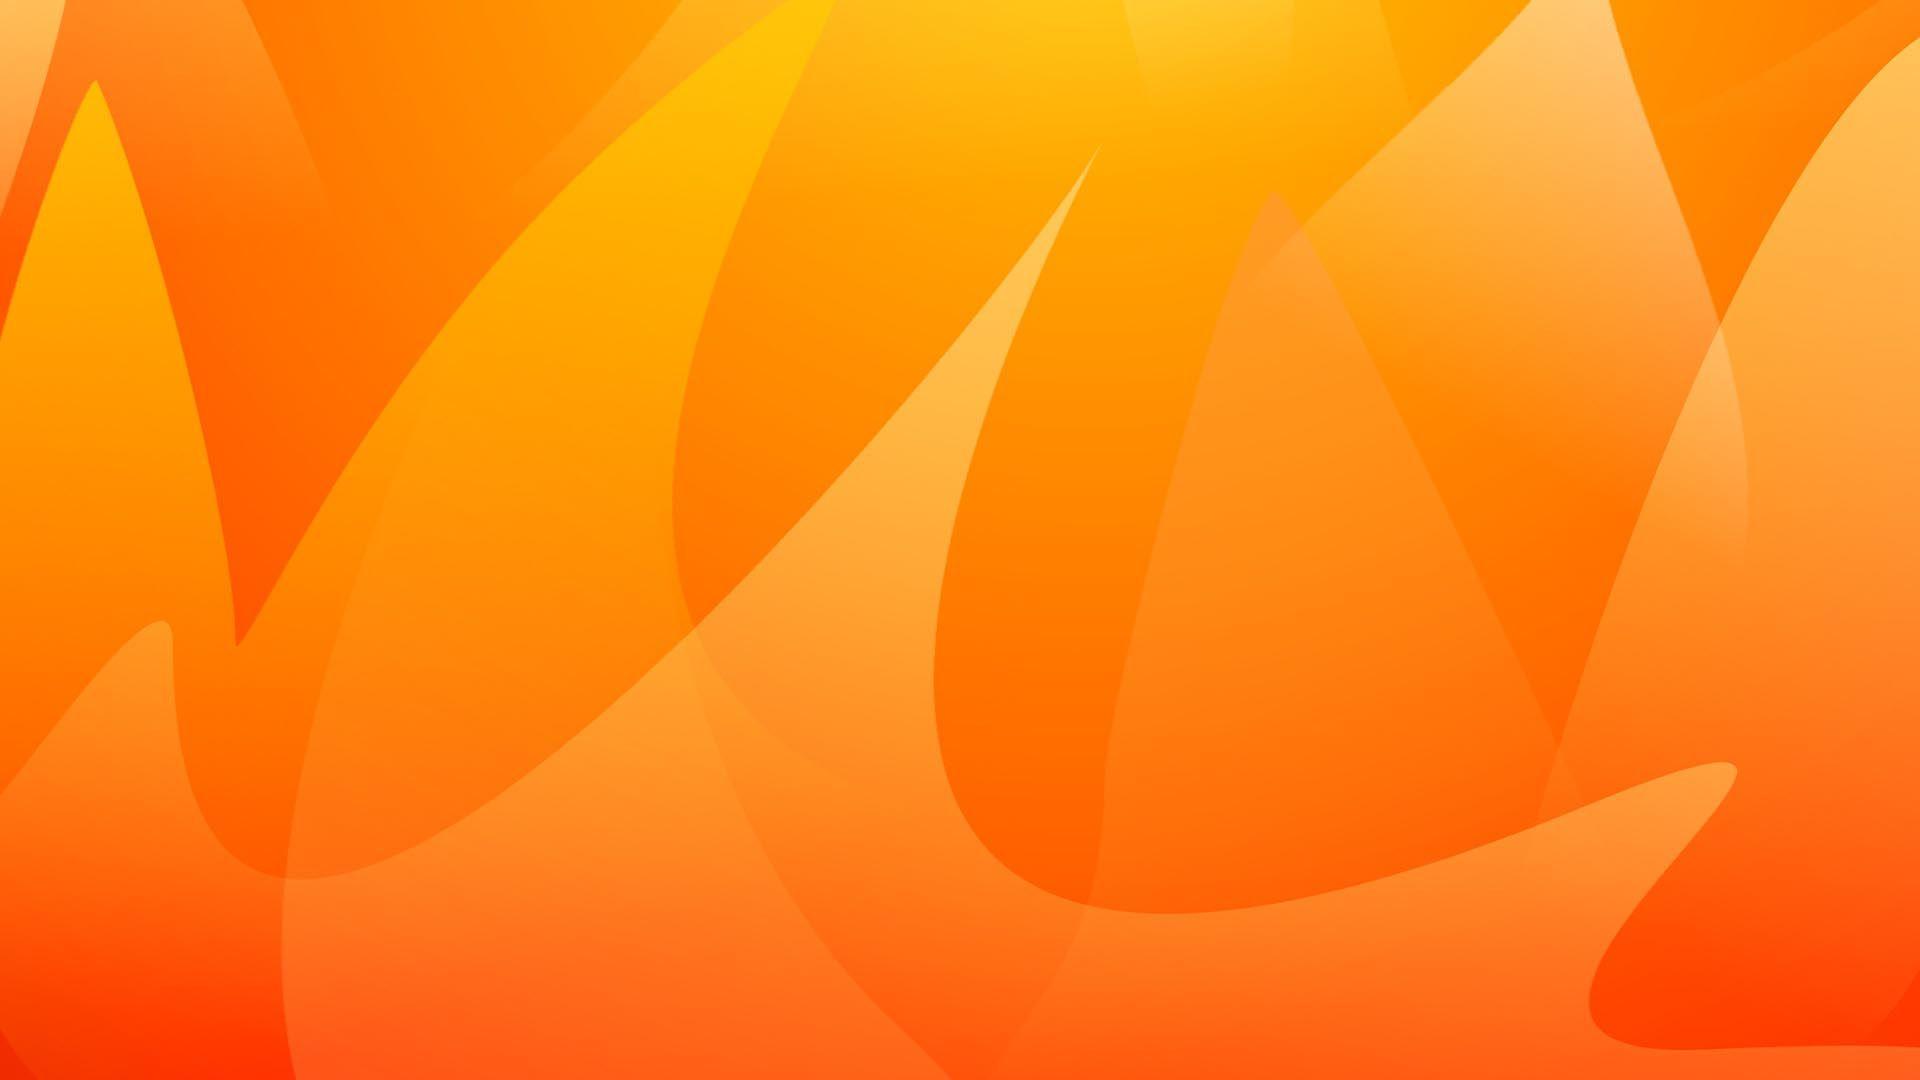 Orange wallpaper download